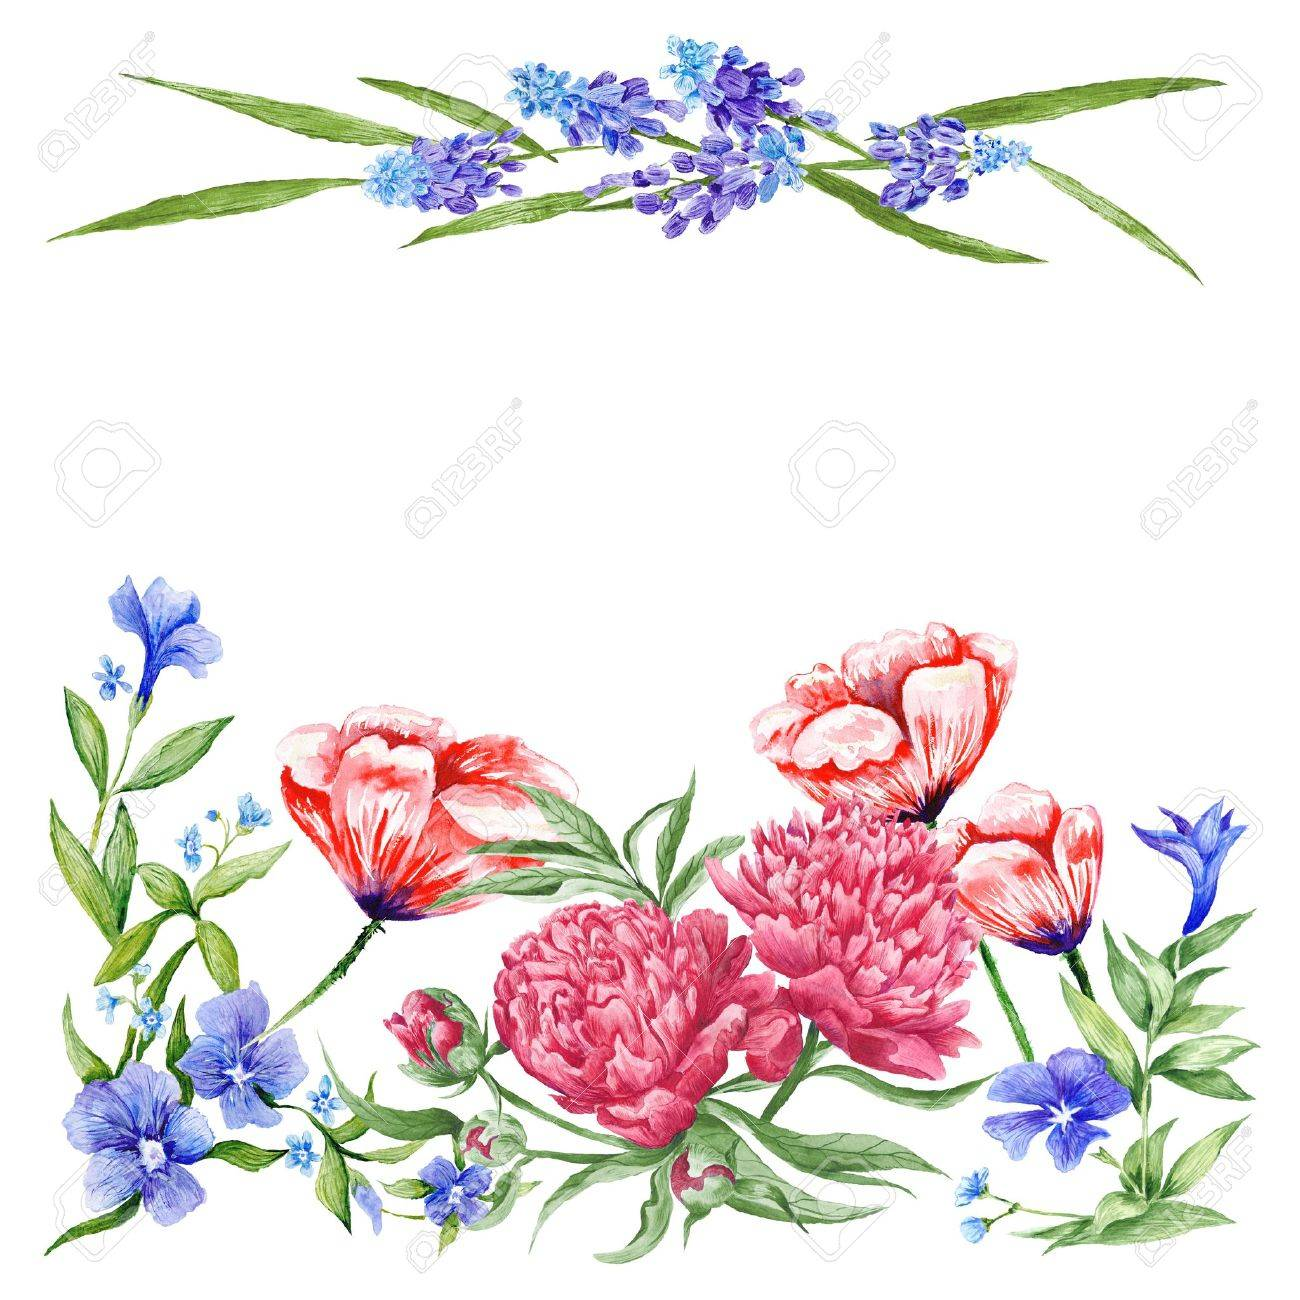 Elegante Romantische Ornamente Mit Mohnblume Pfingstrose Muskari